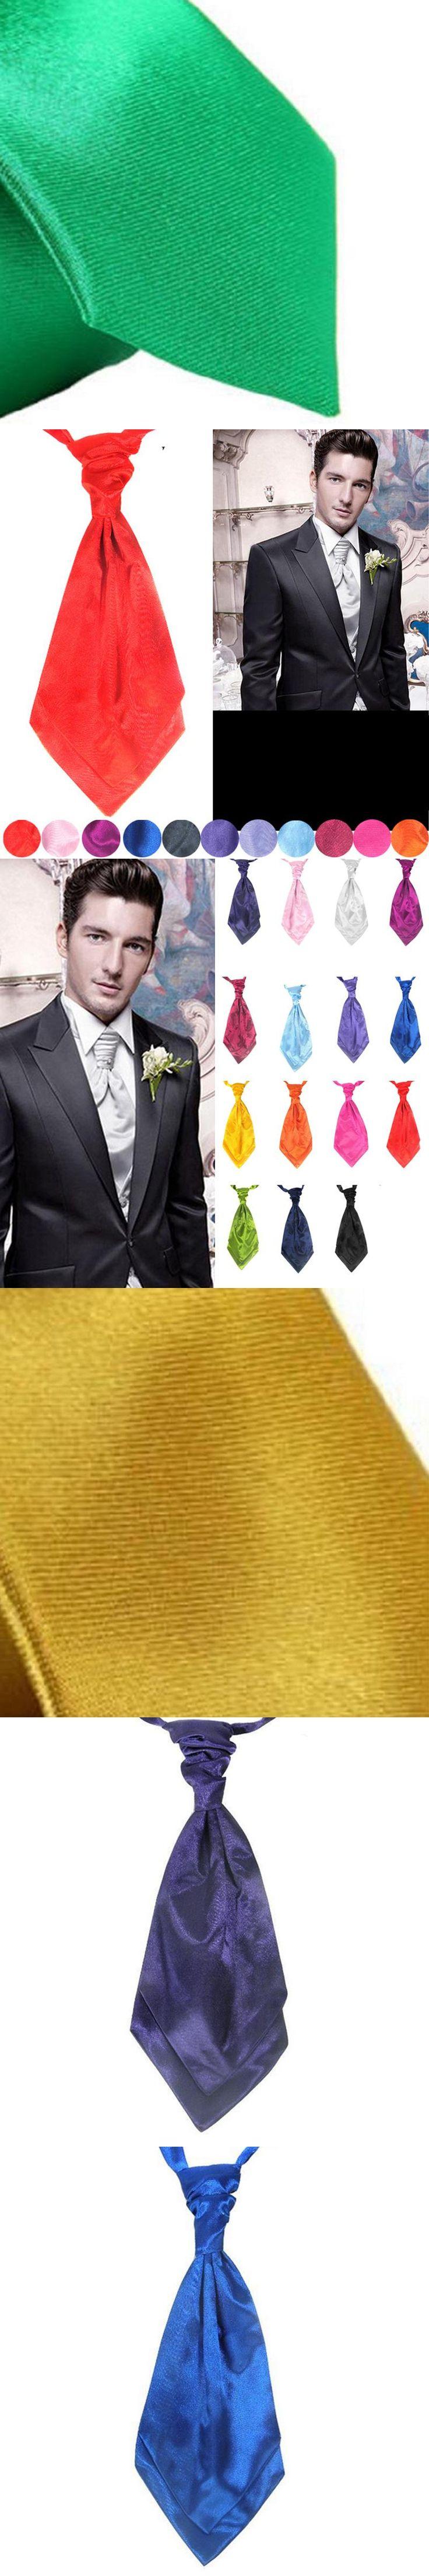 Mens Jacquard Tuxedo Pre Tie 2017 New Fashion Brand Designer Suit Cravat Tie Party Wedding Big Size Navy Red Gray Purple Necktie